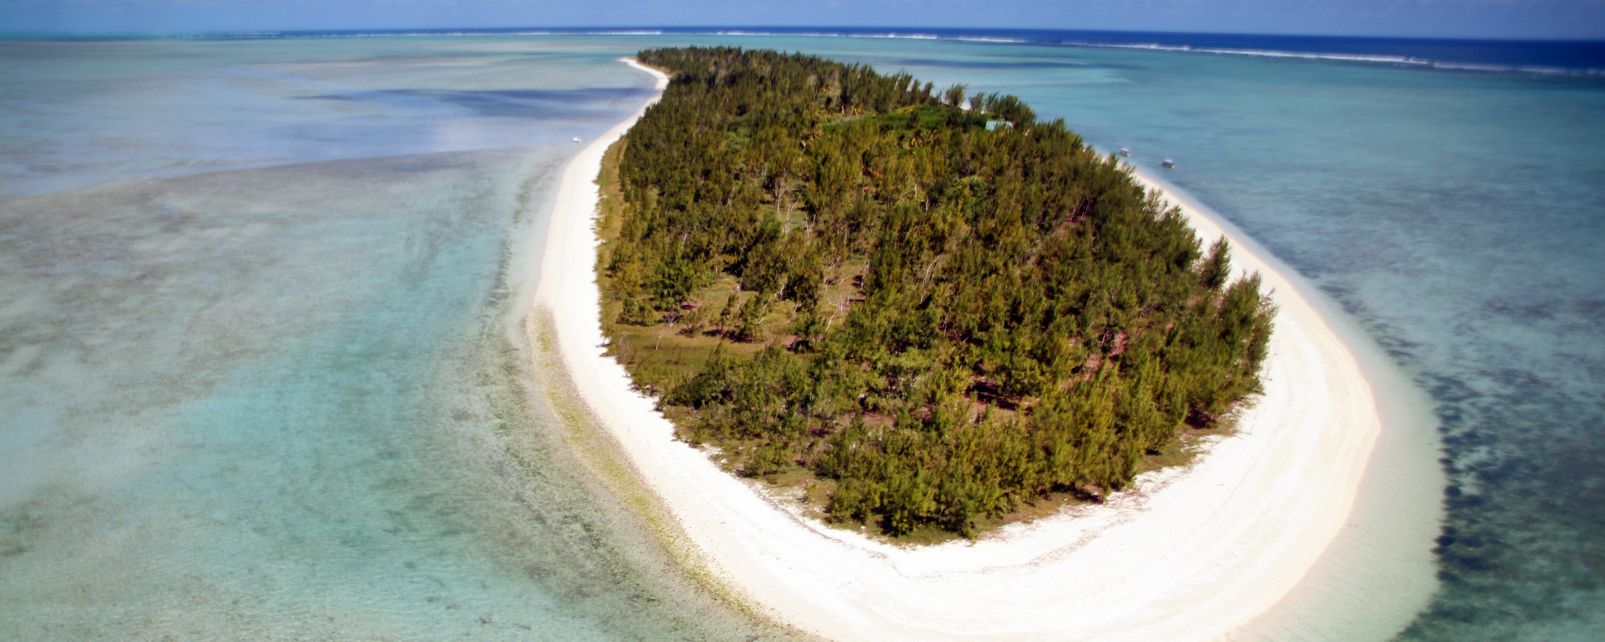 Where Is Cindy Island